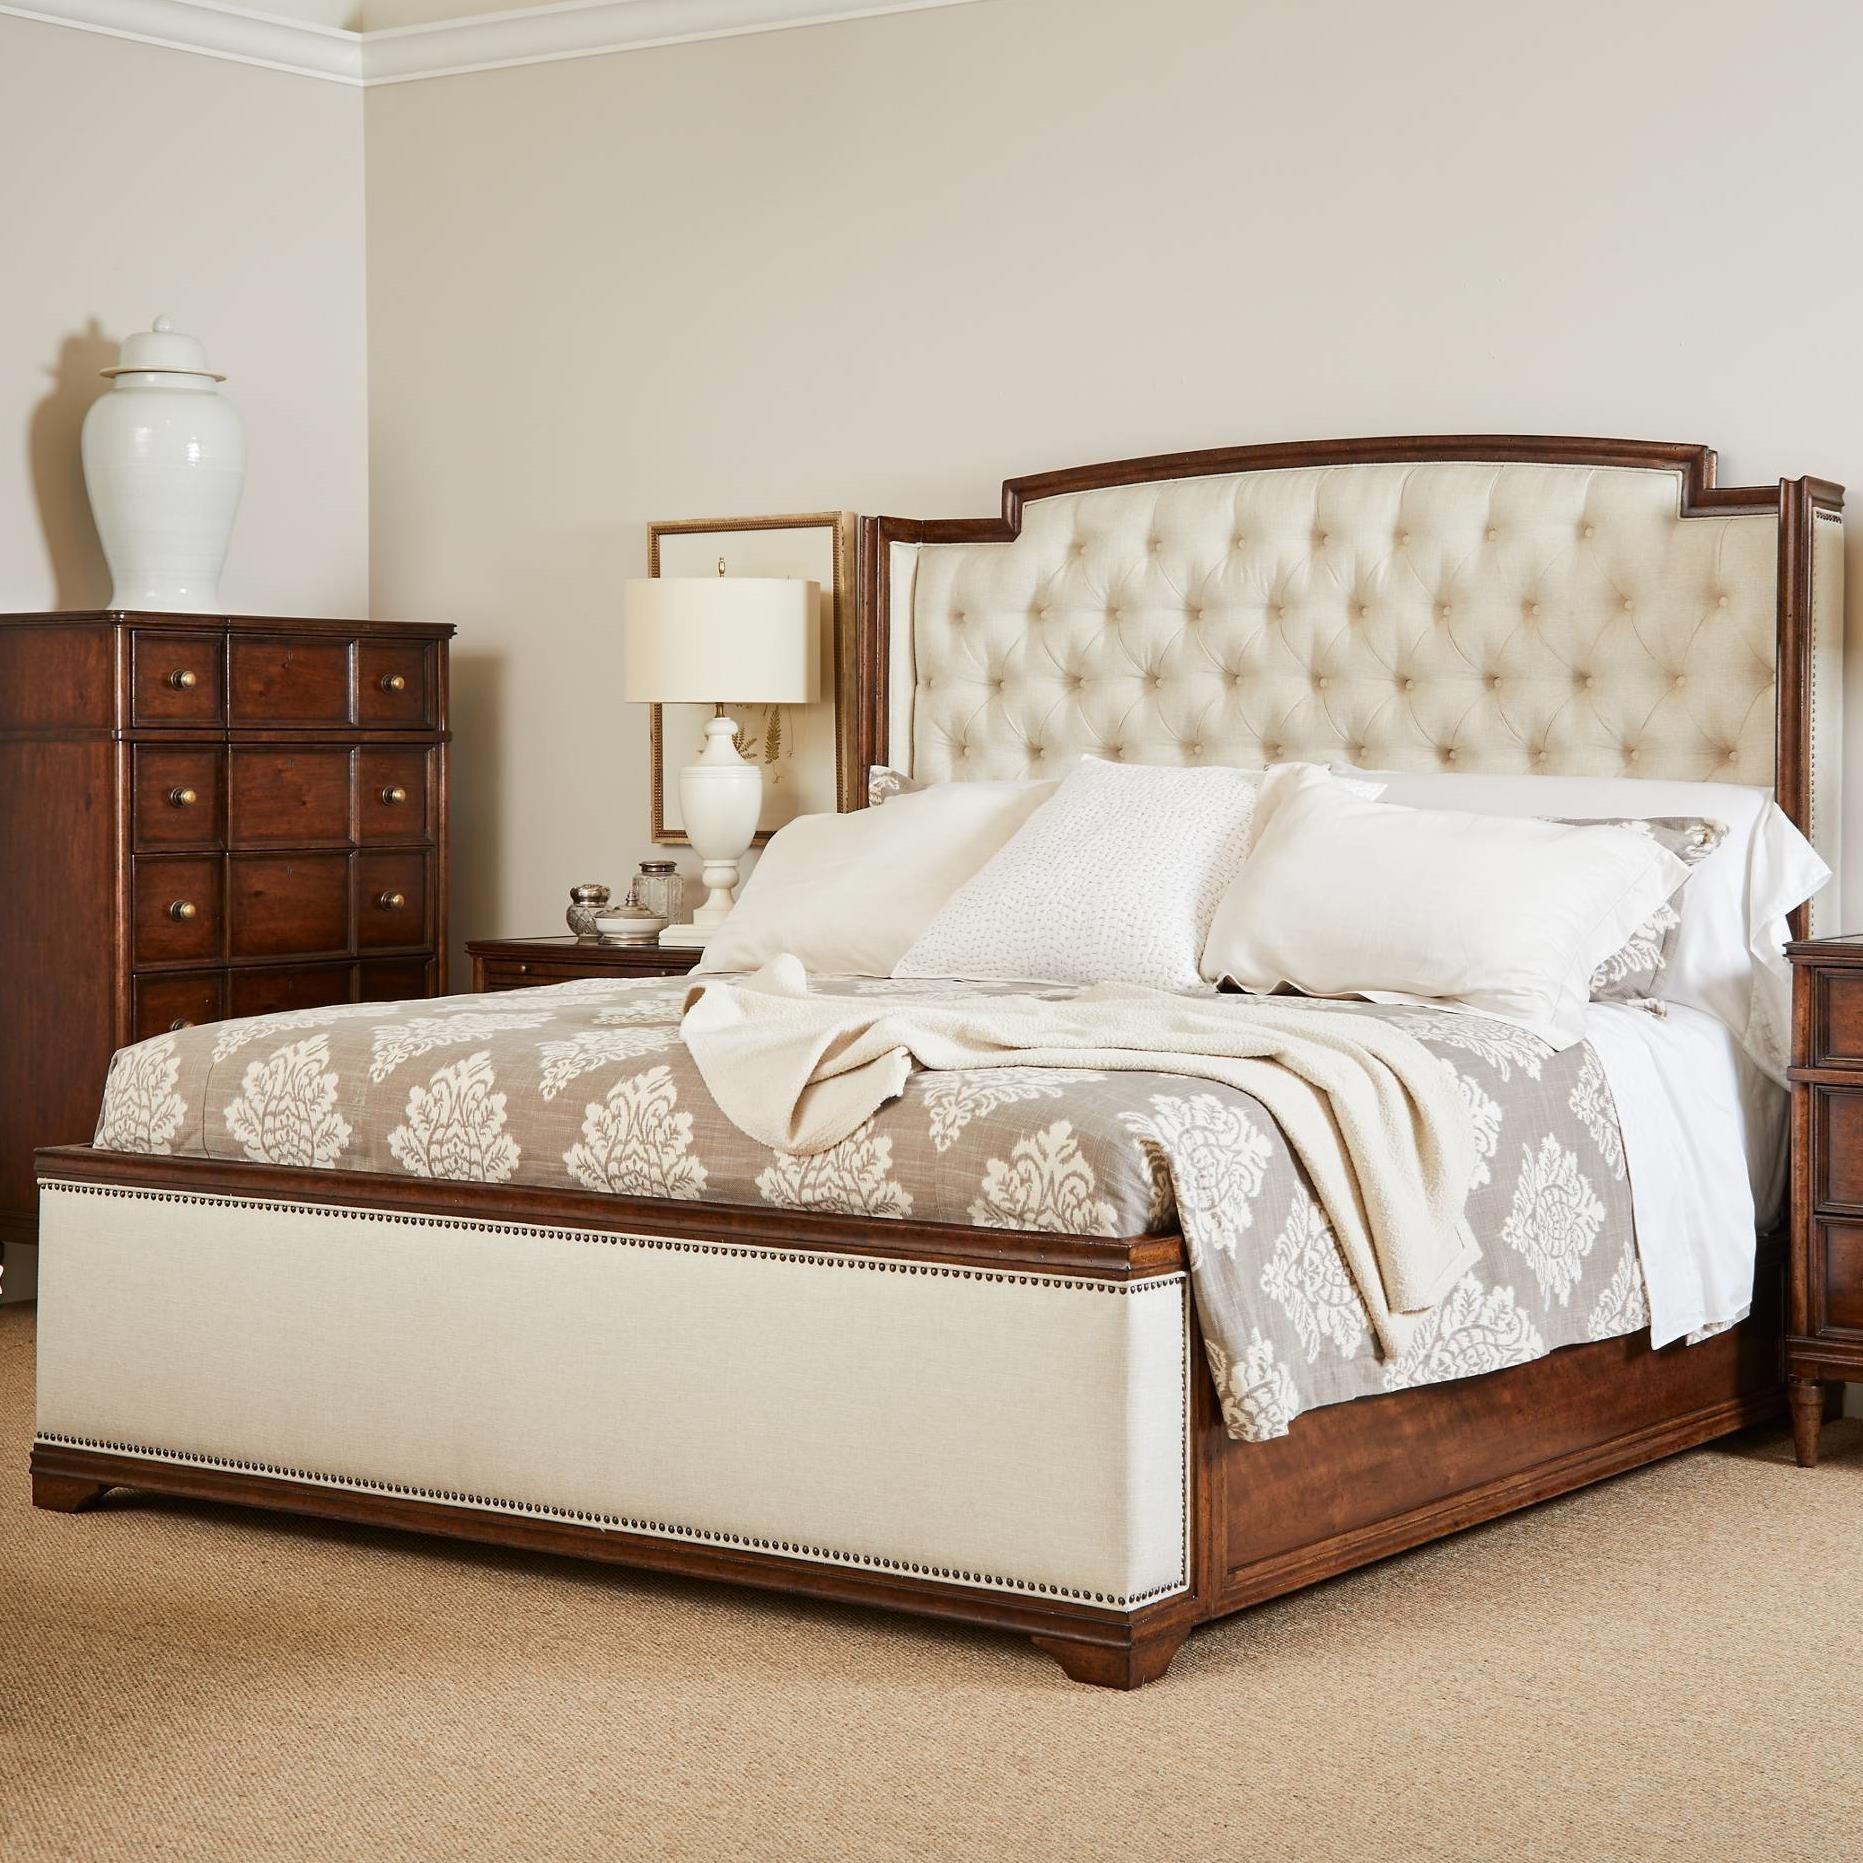 stanley furniture vintage 264 13 52